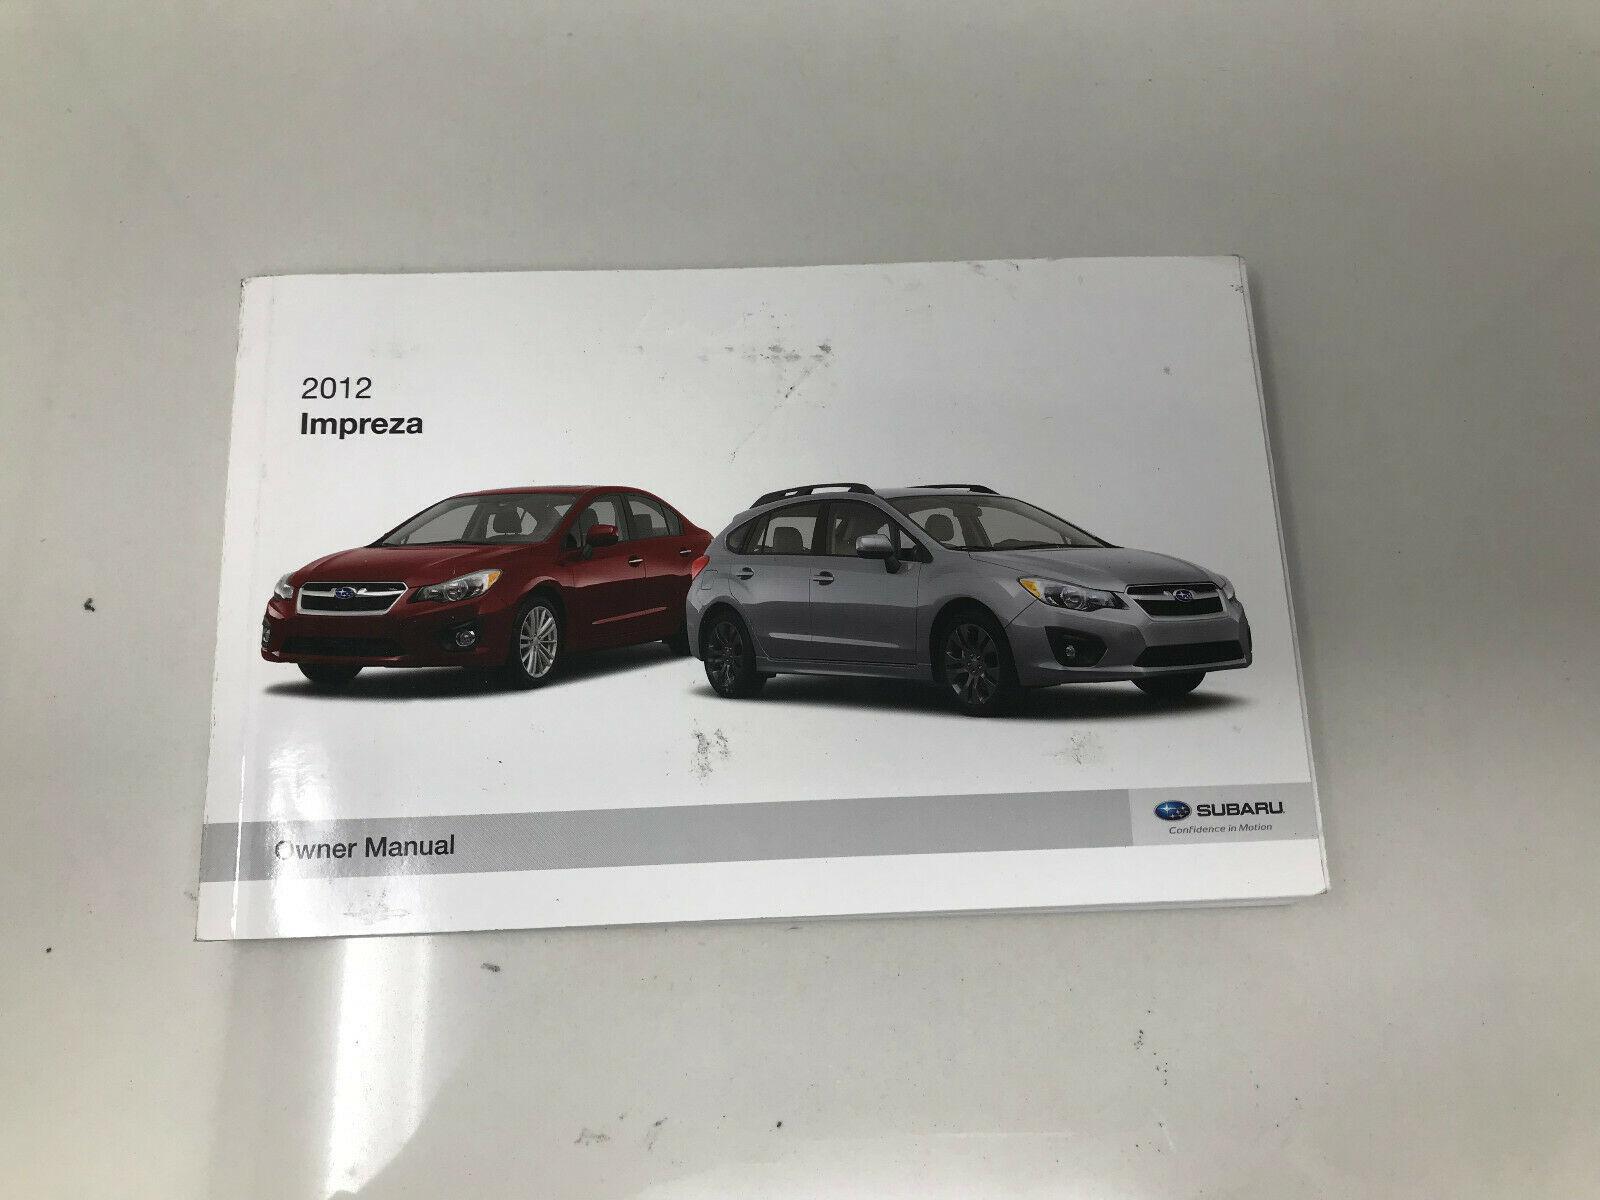 2012 Subaru Impreza Owners Manual book Z0C39